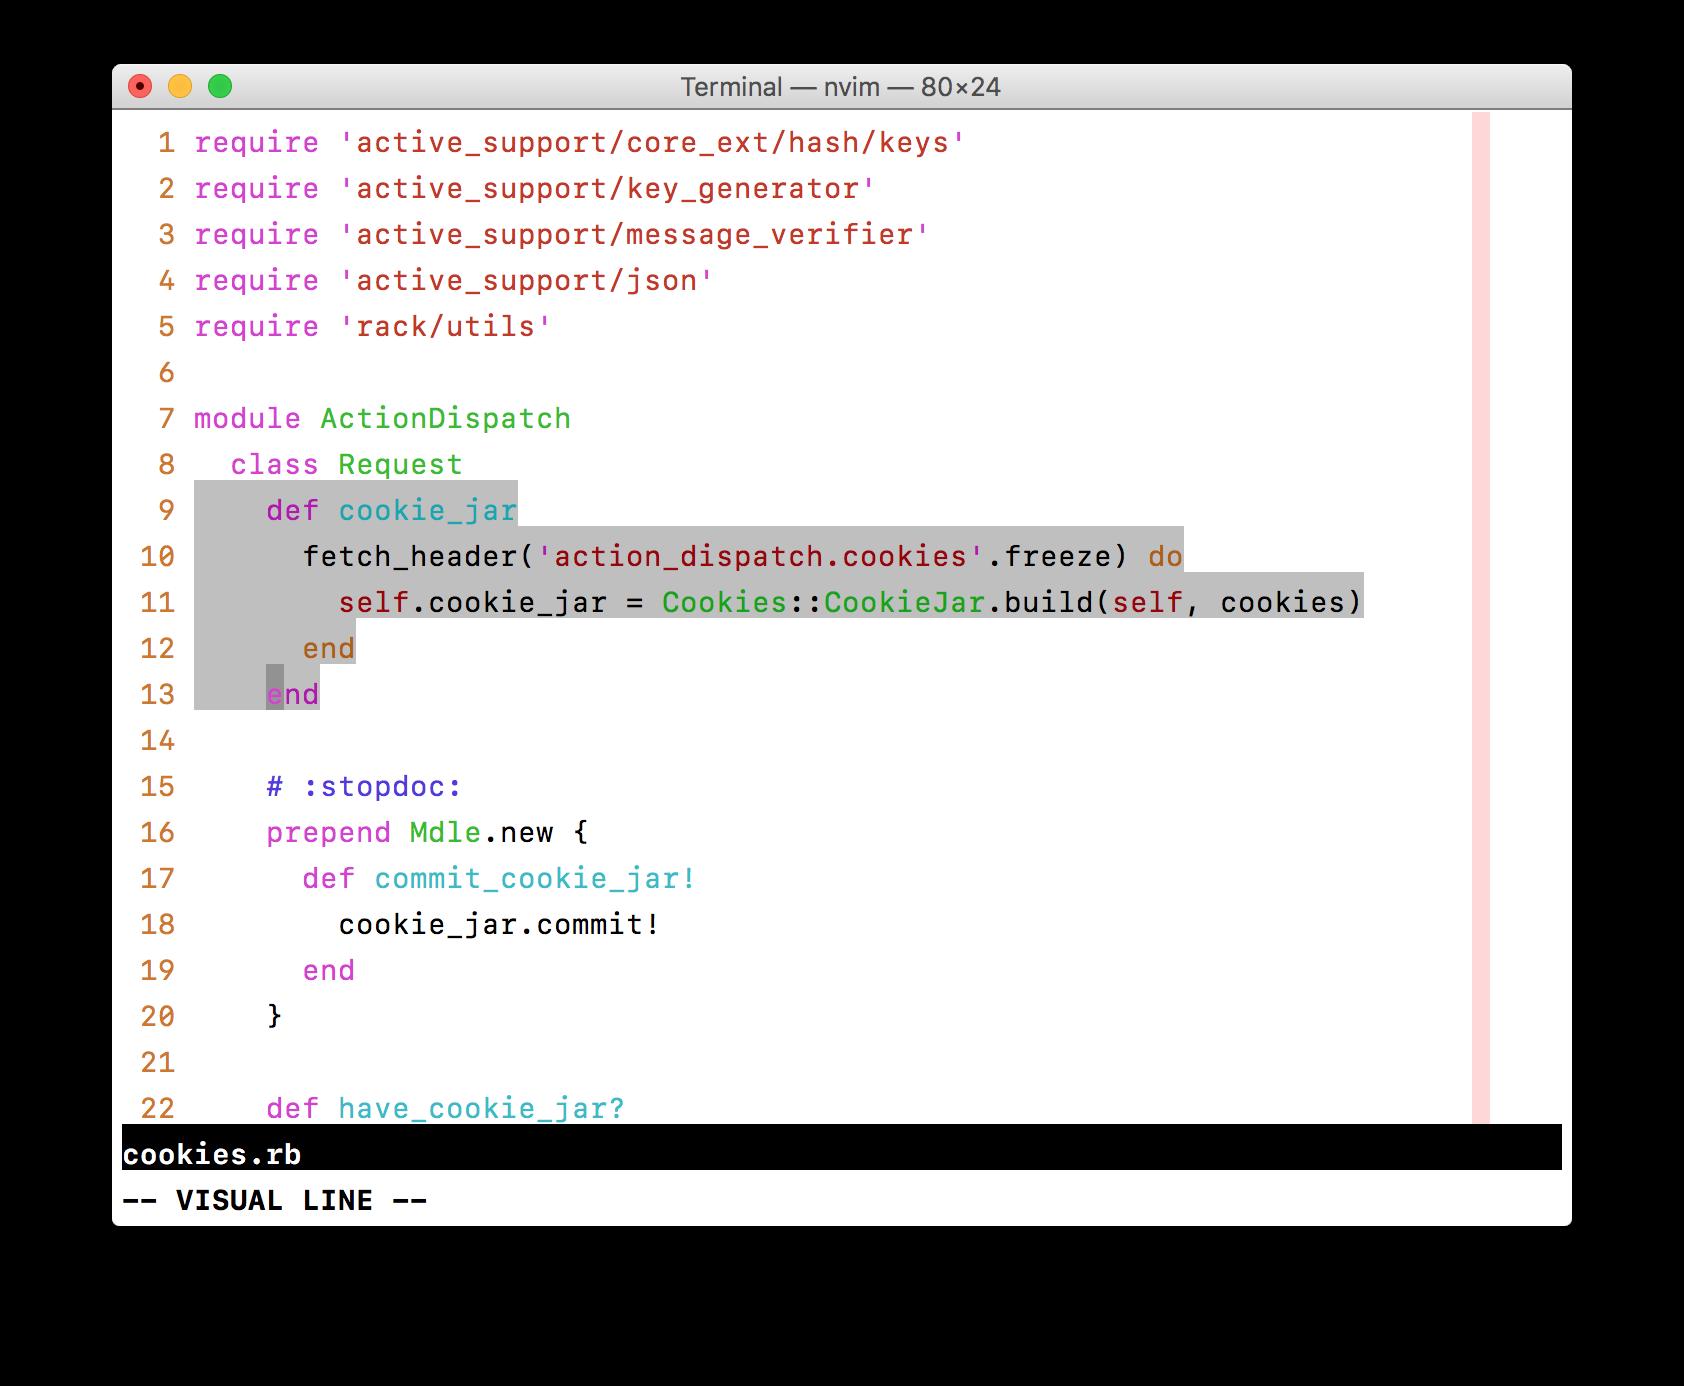 Selections in Vim's default color scheme